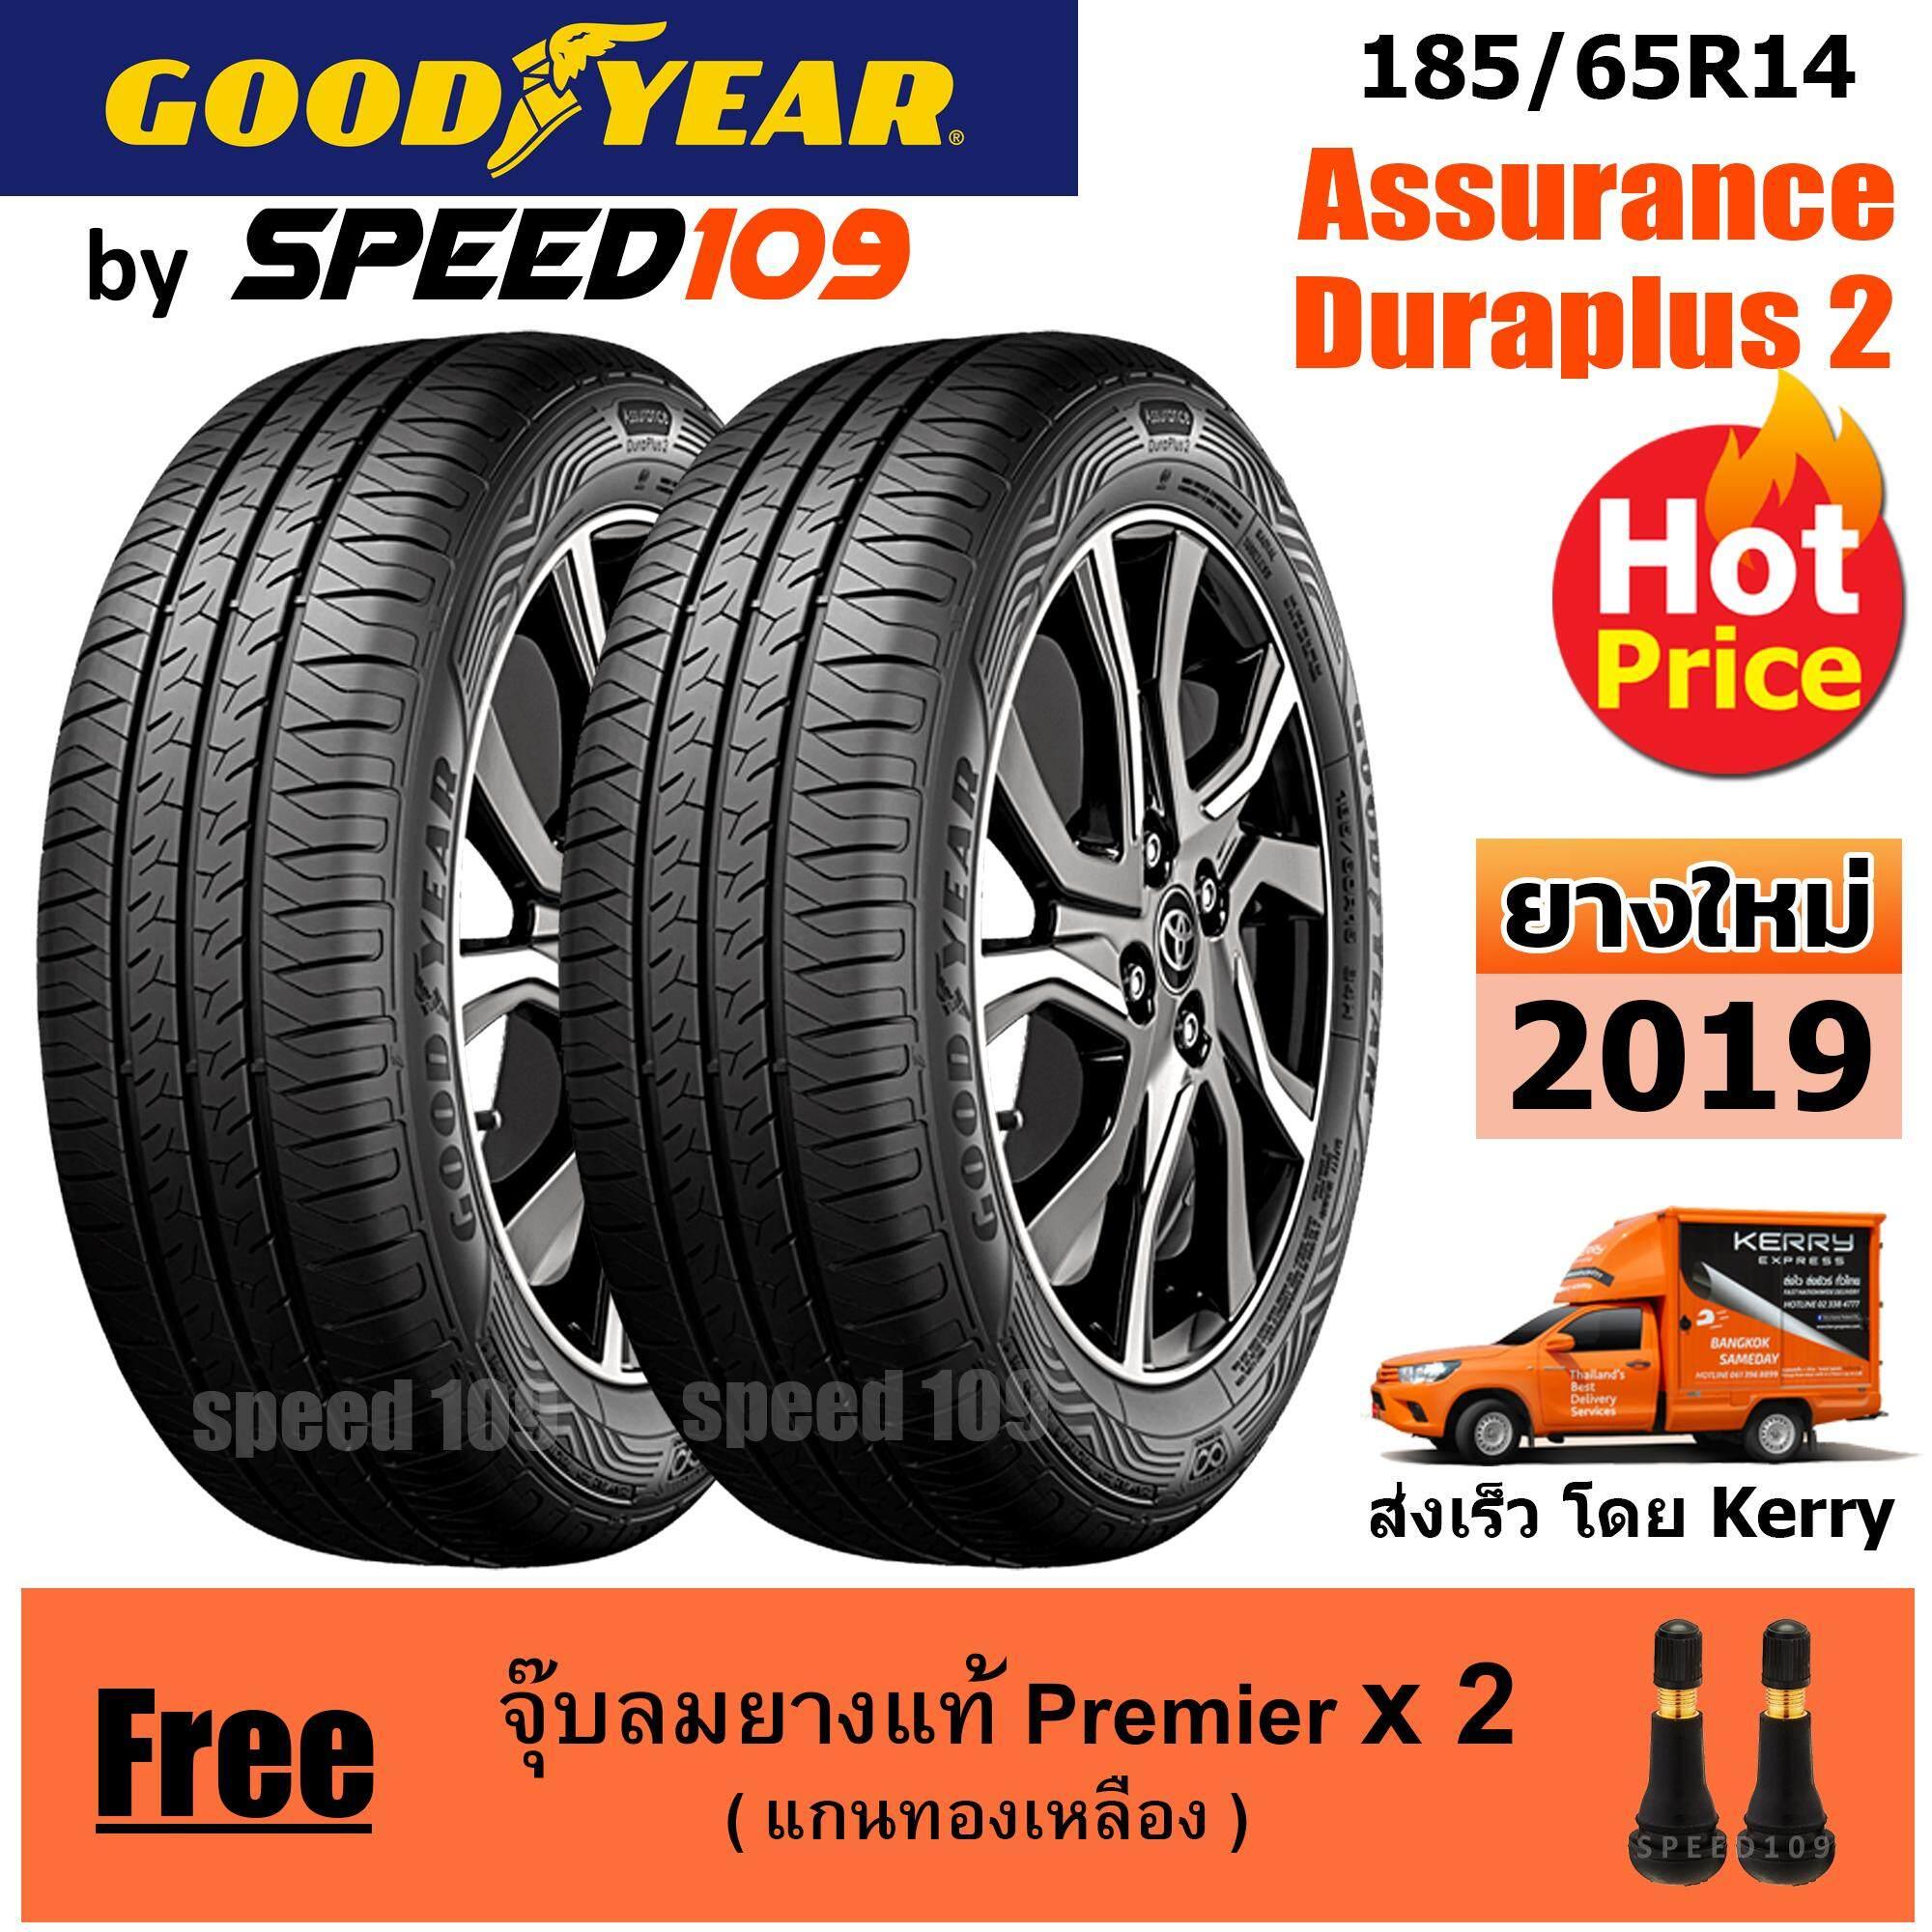 GOODYEAR ยางรถยนต์ ขอบ 14 ขนาด 185/65R14 รุ่น Assurance Duraplus 2 - 2 เส้น (ปี 2019)